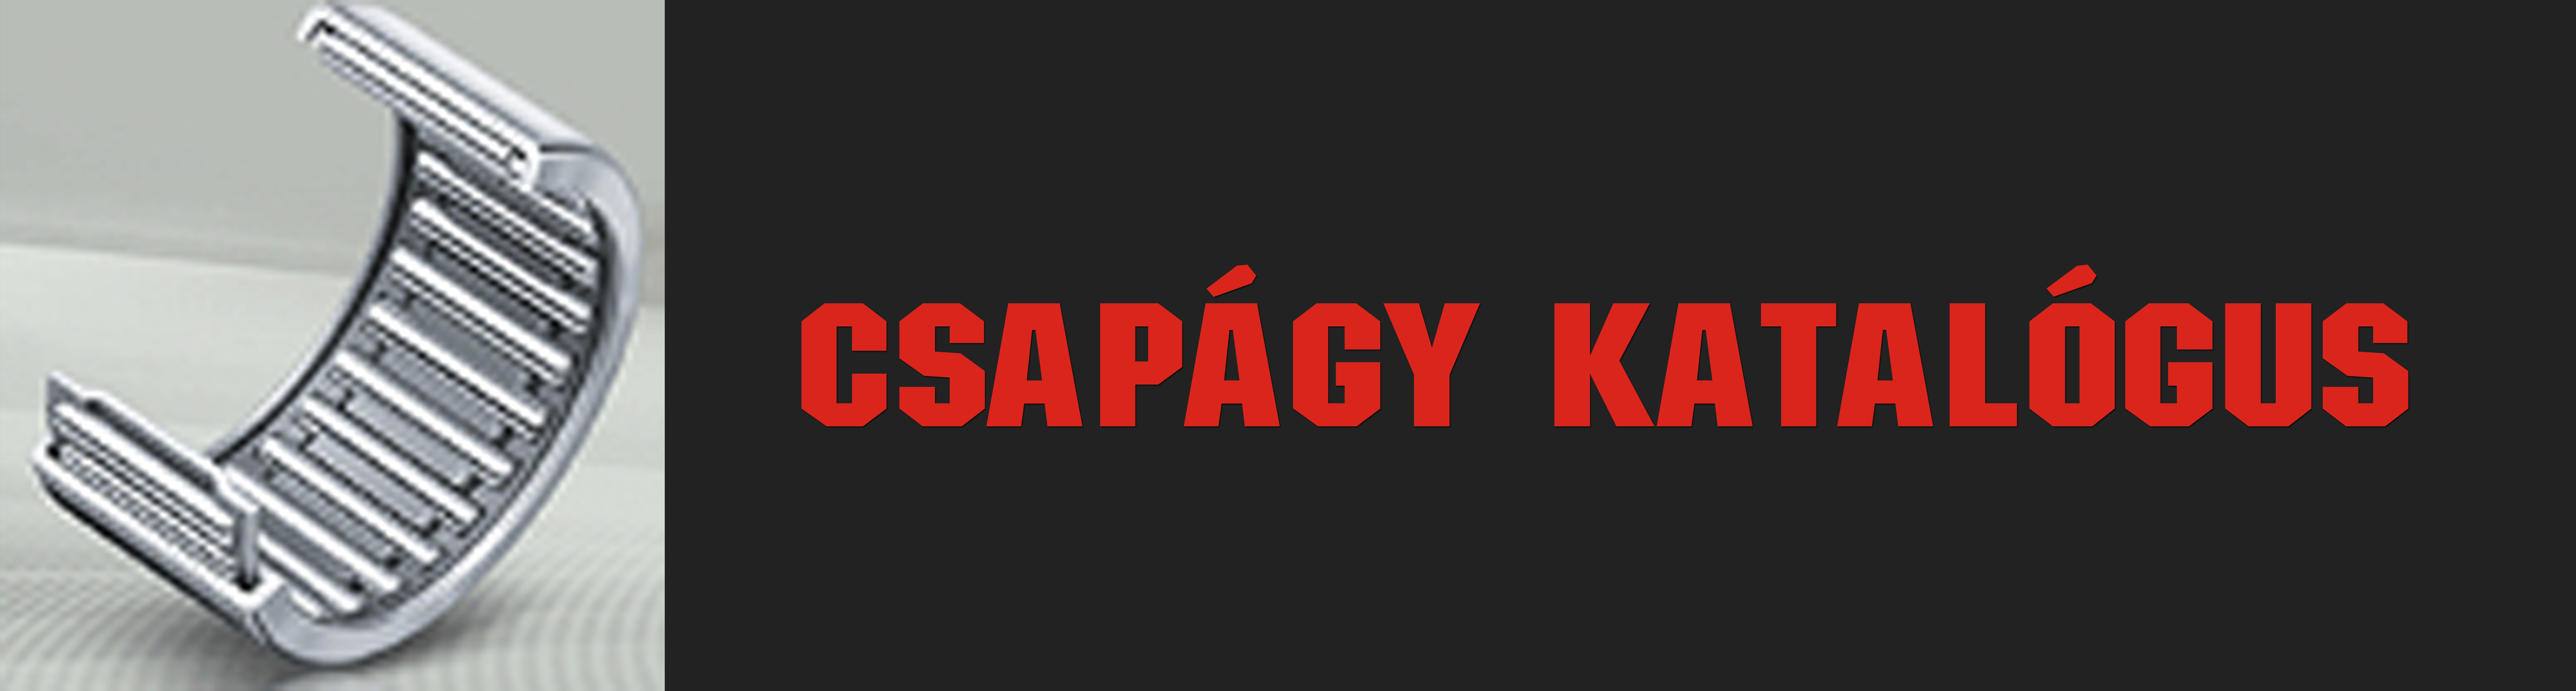 csapagy_katalogus